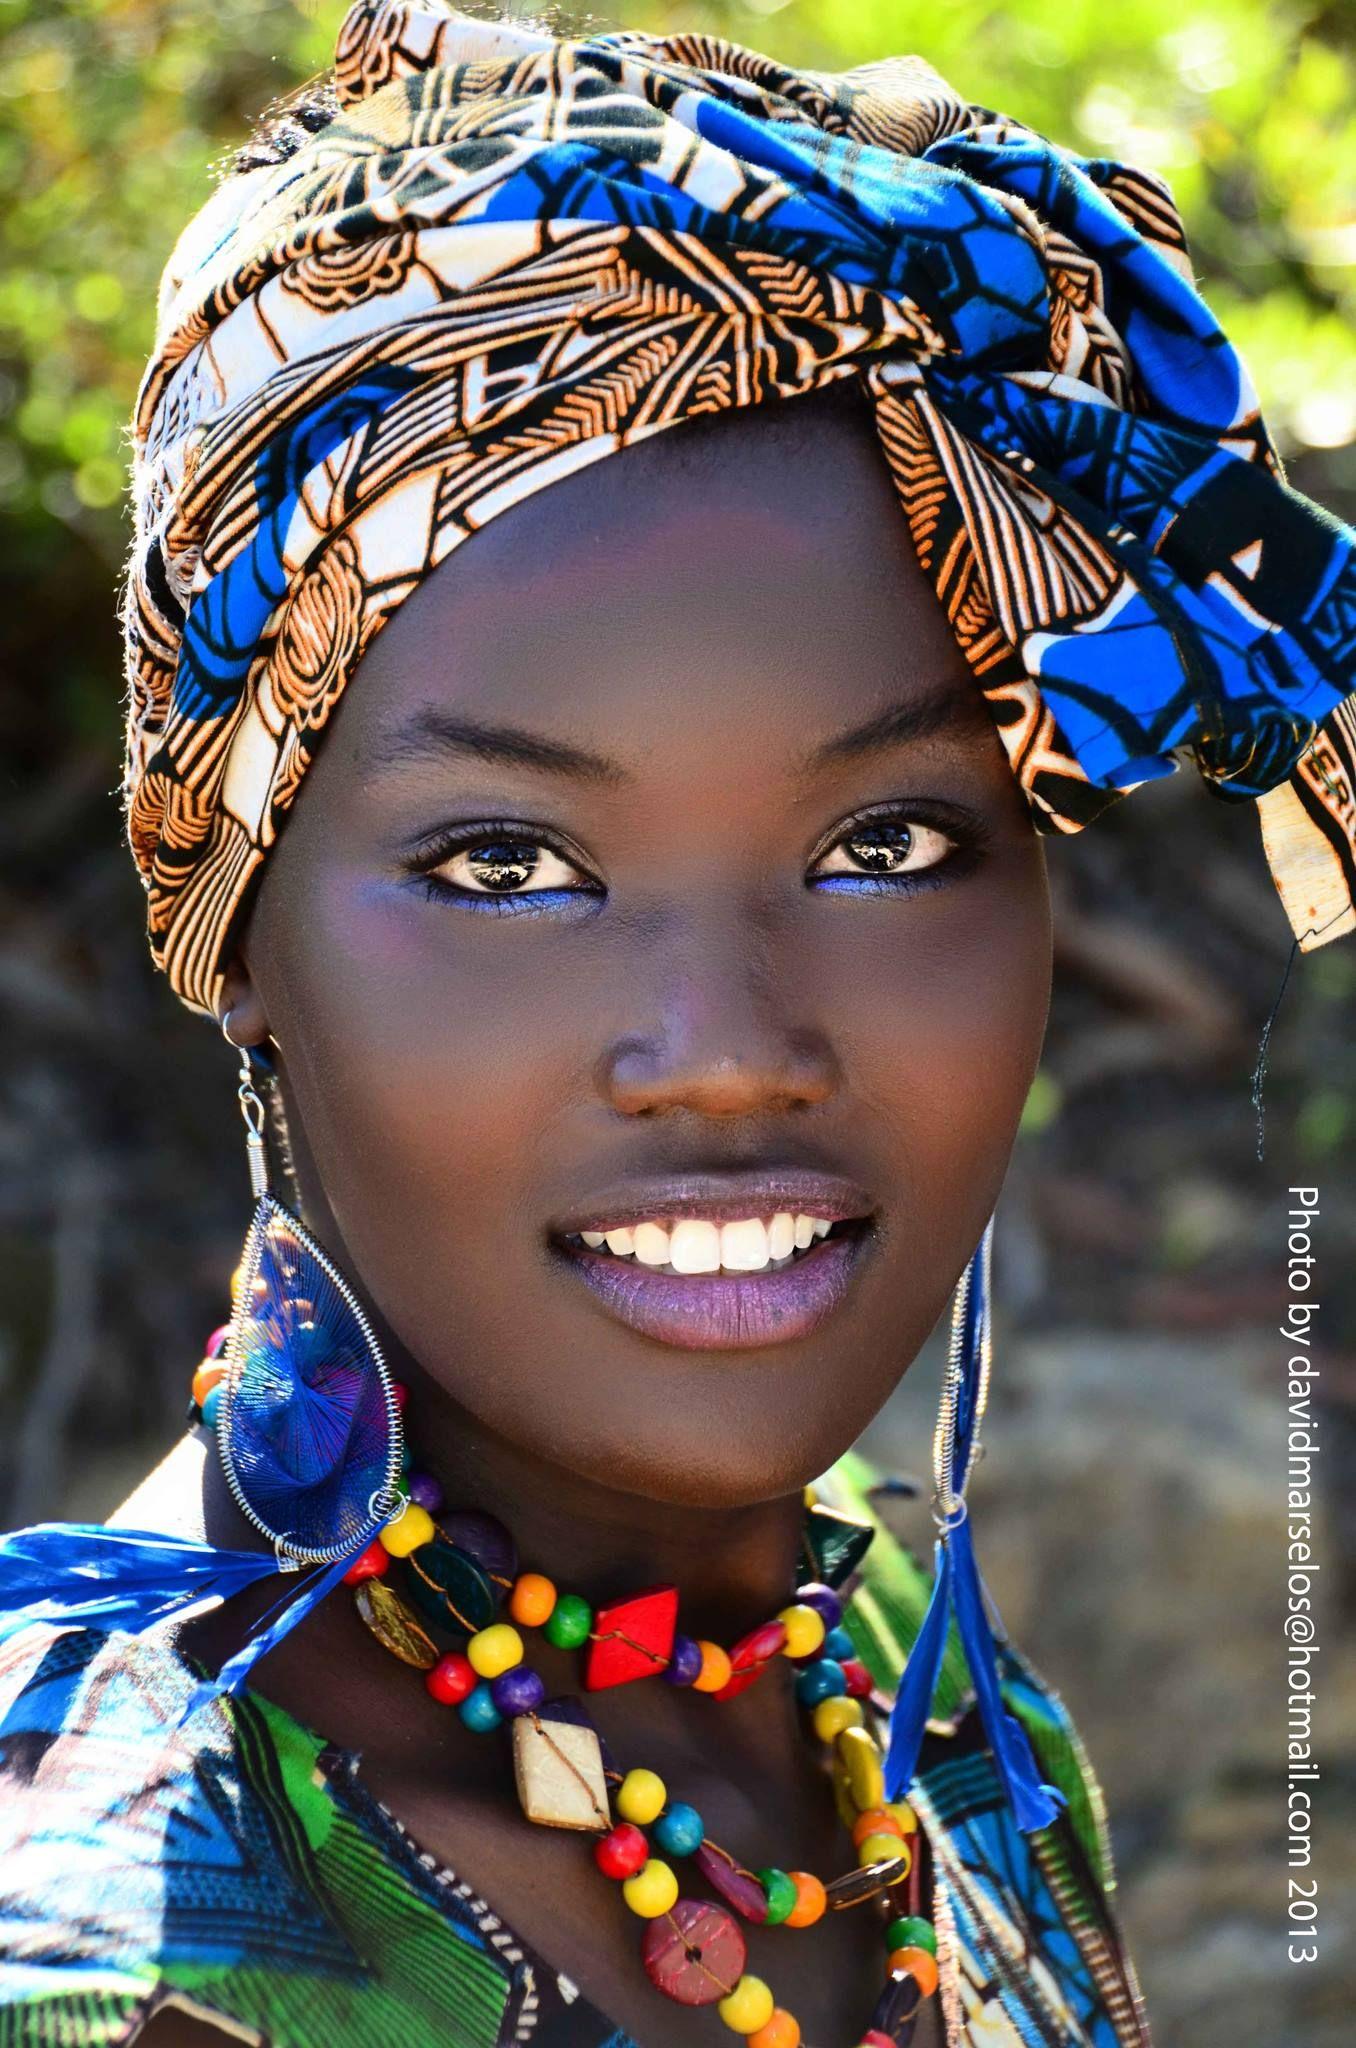 Wild girls black, beautiful naked girl with white skin